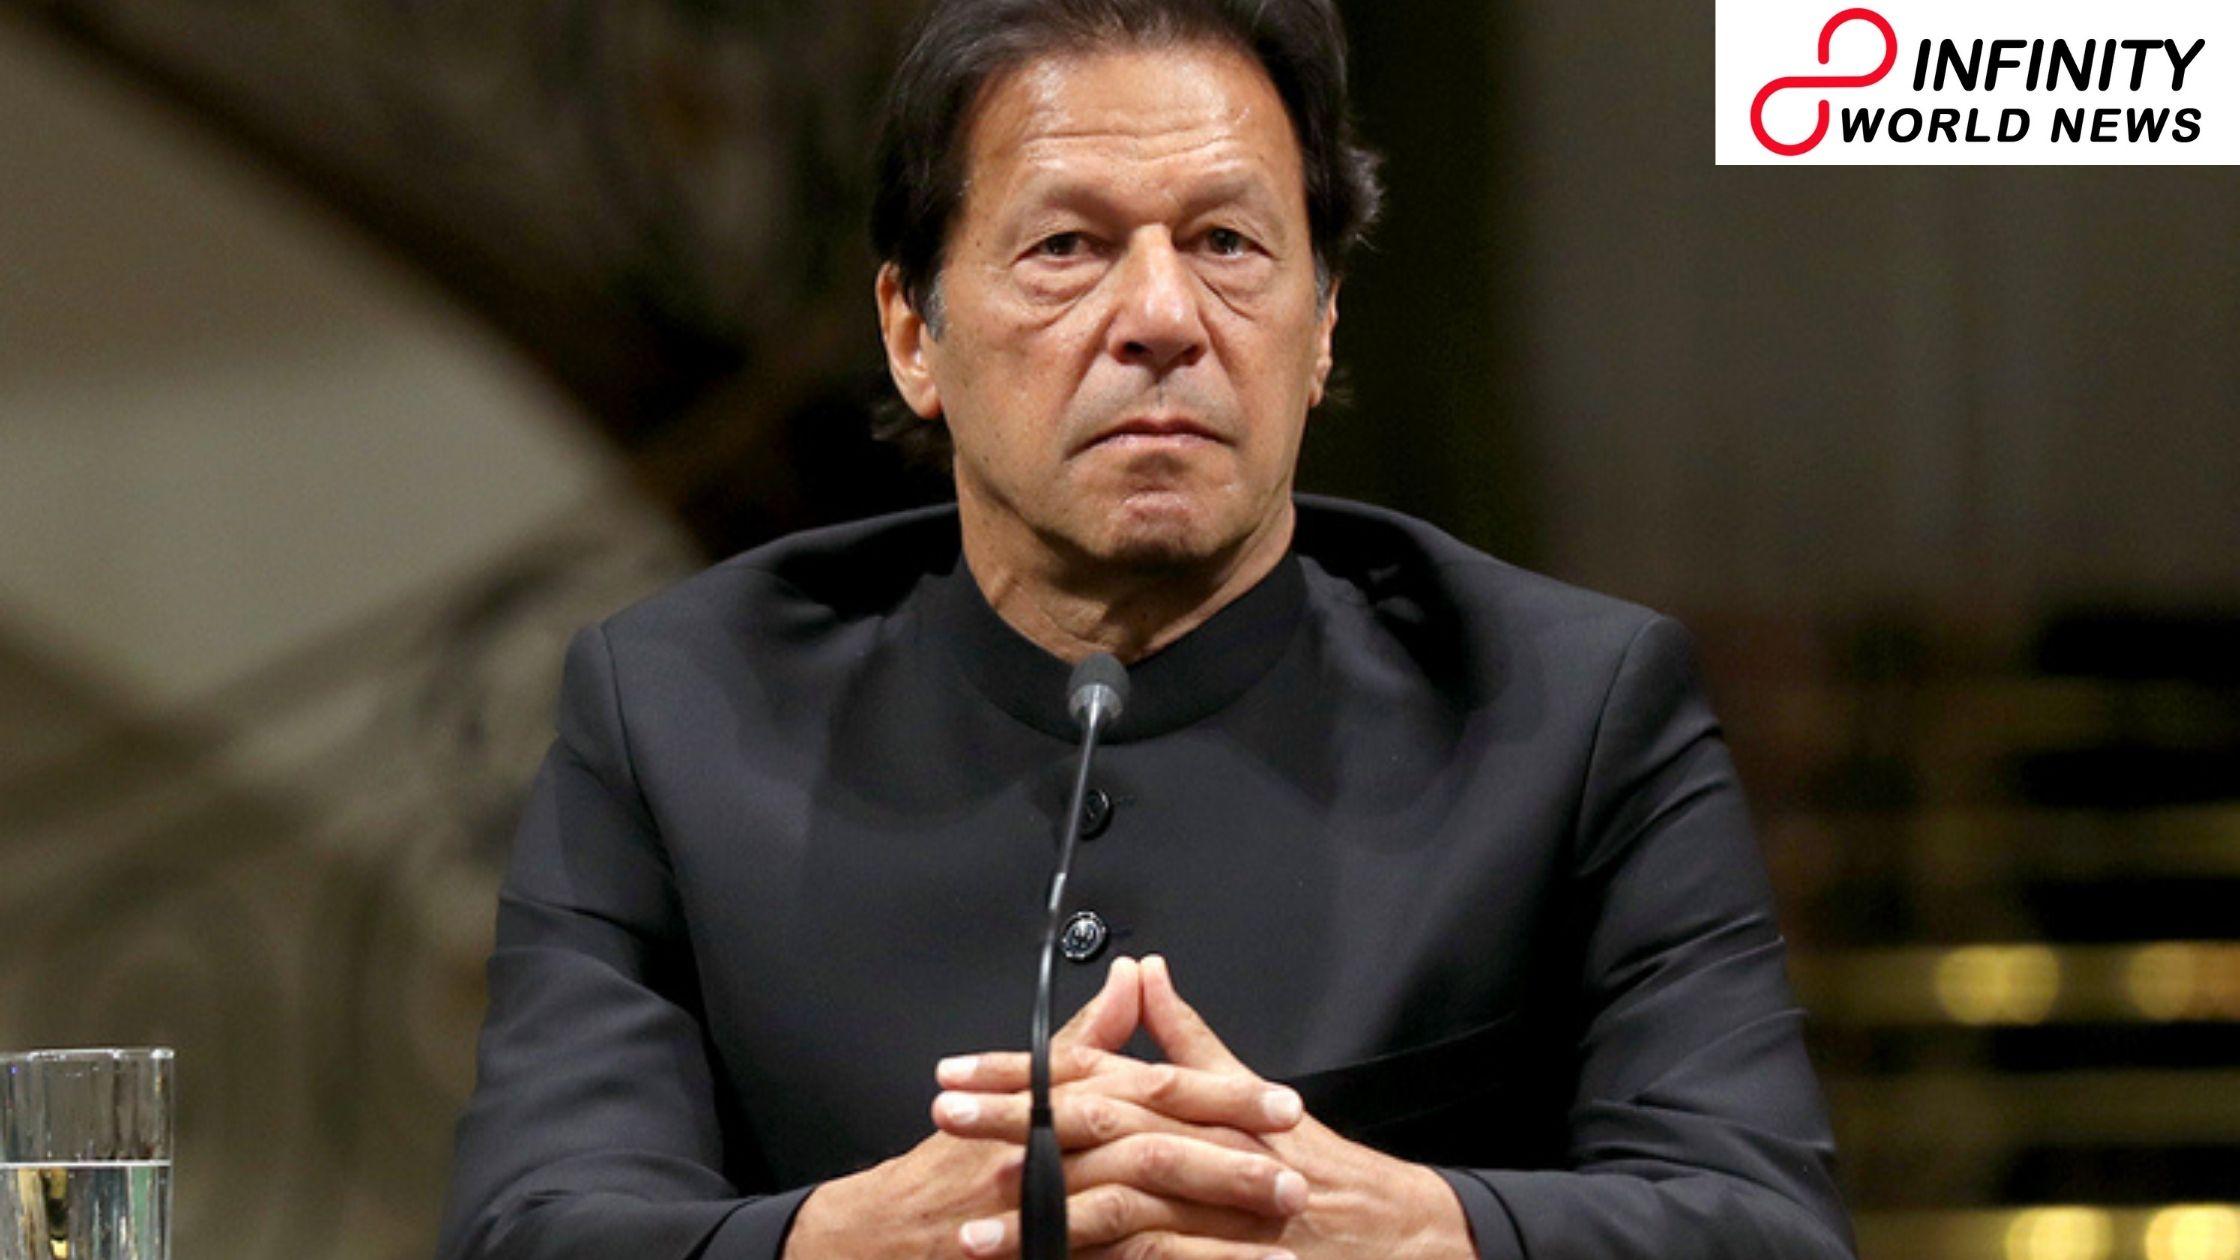 What Pakistan said on Pulwama